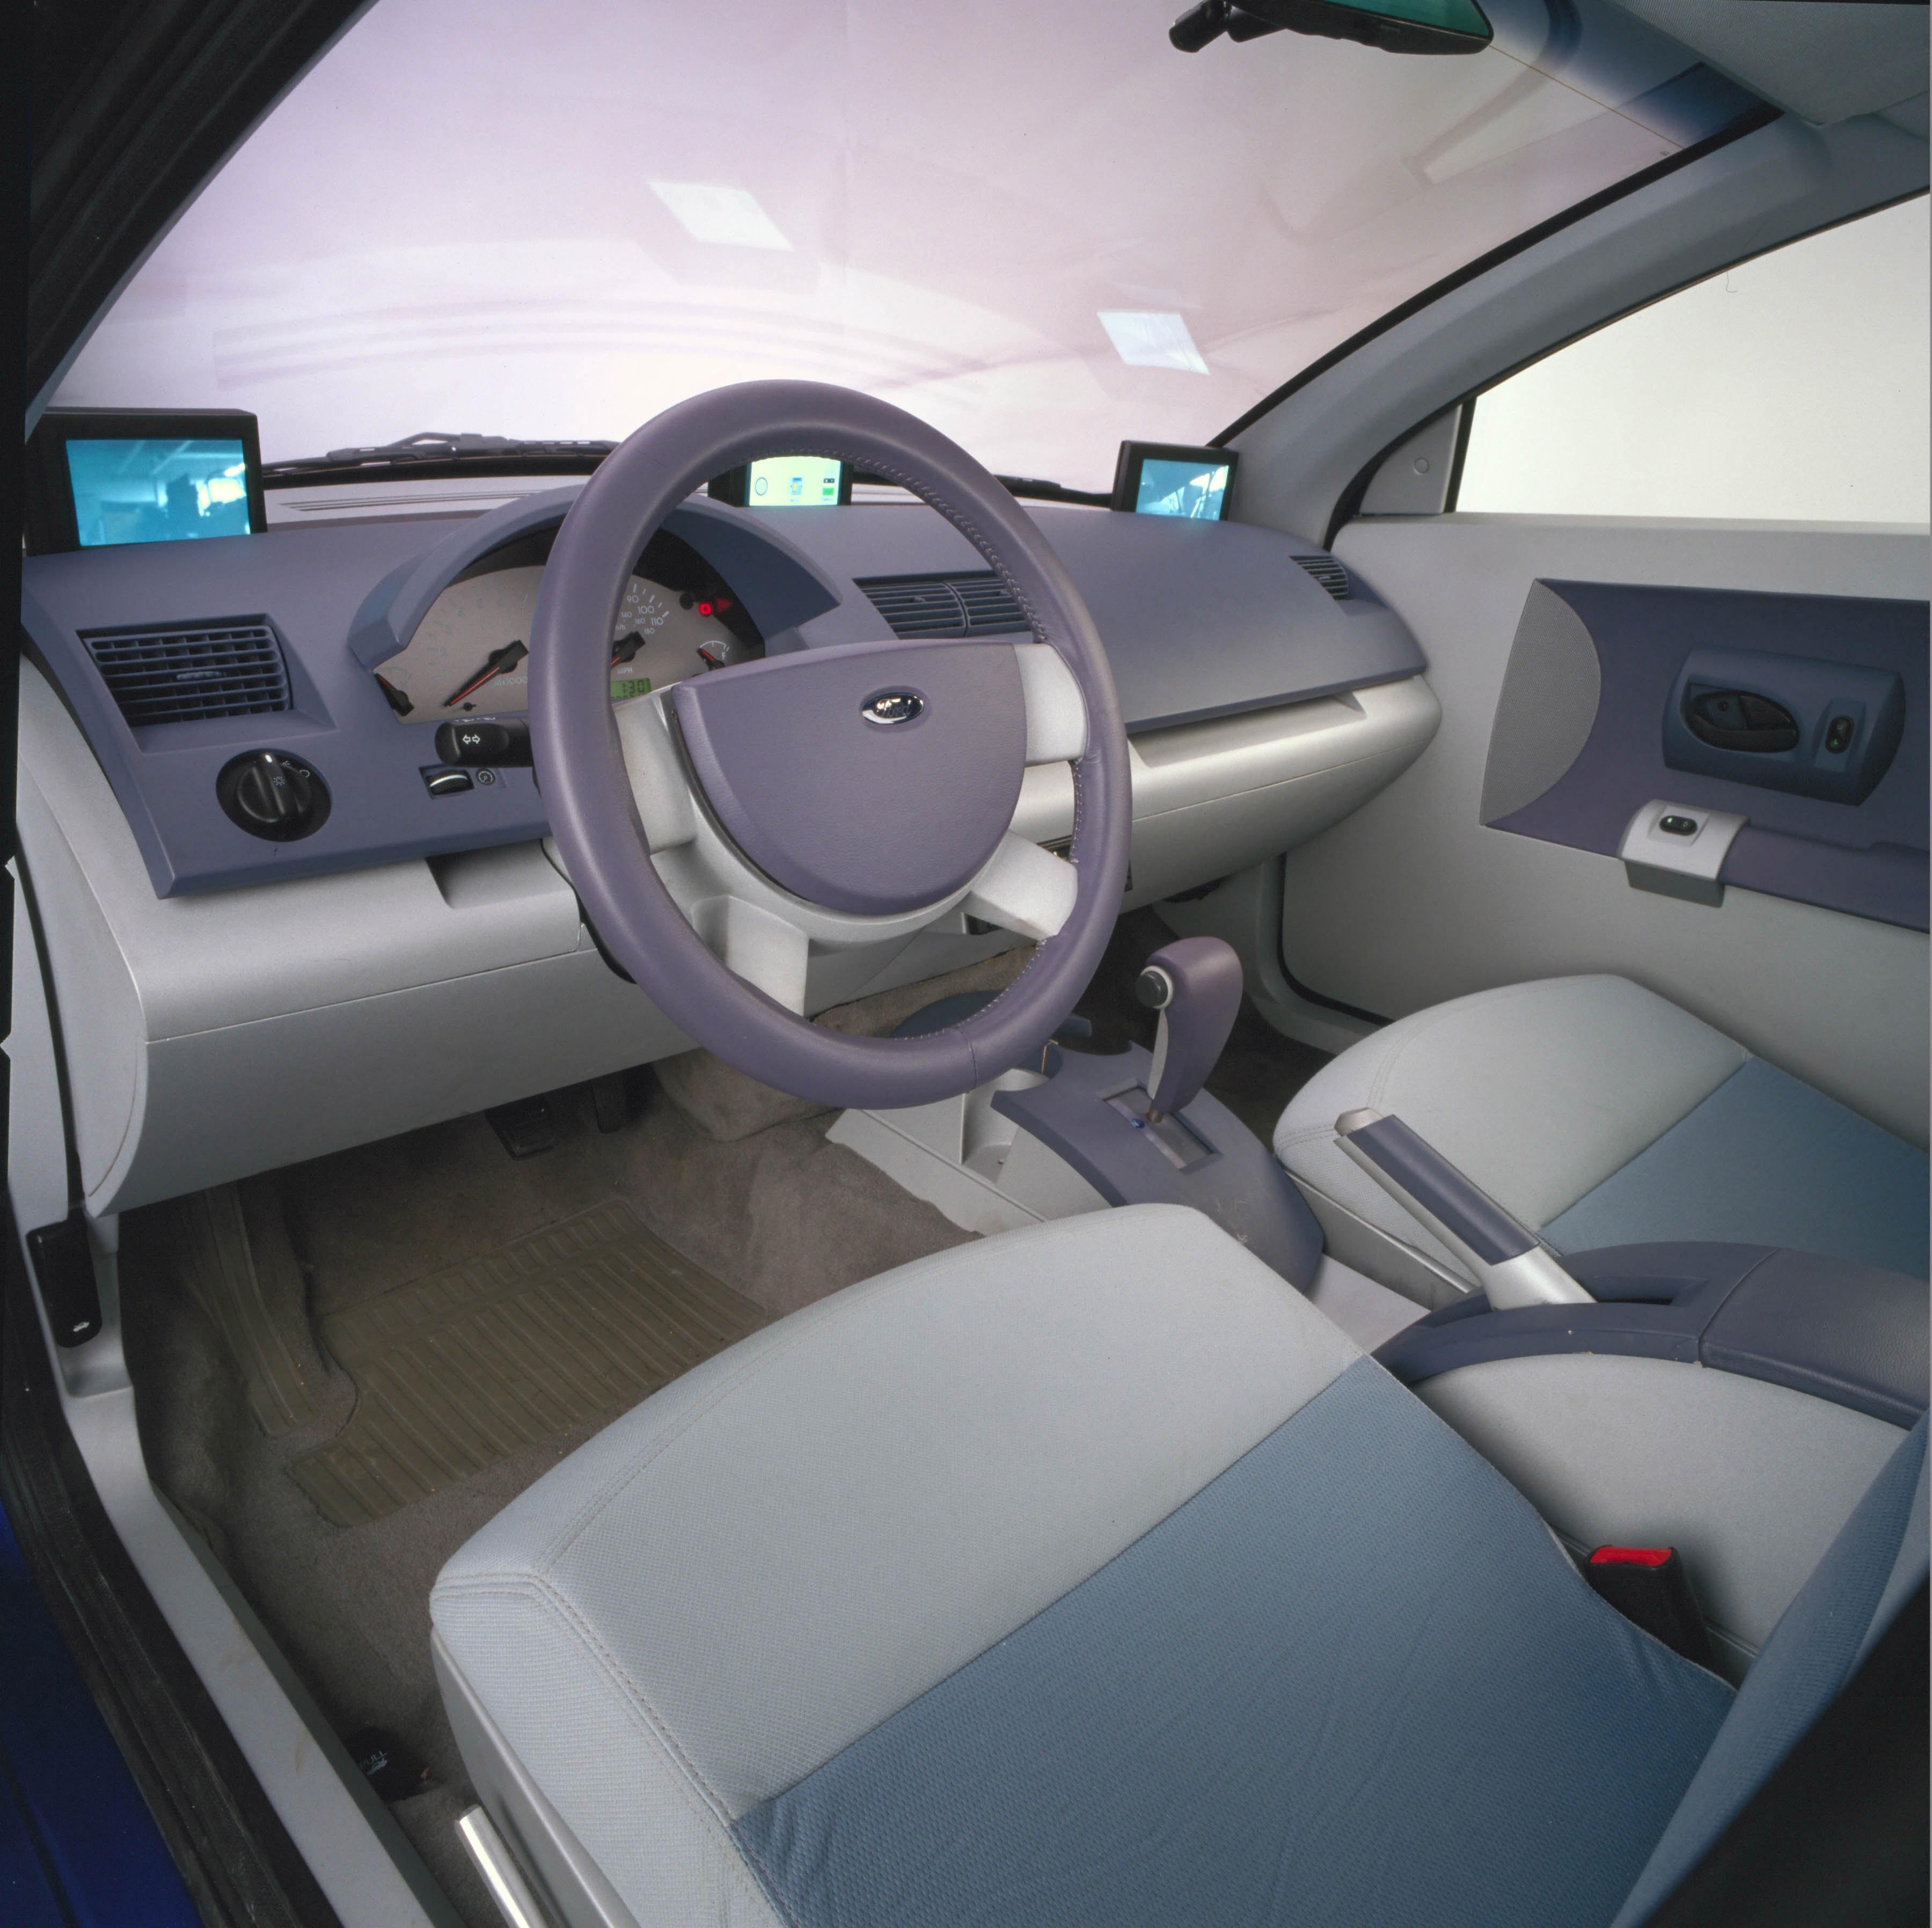 GM Precept concept